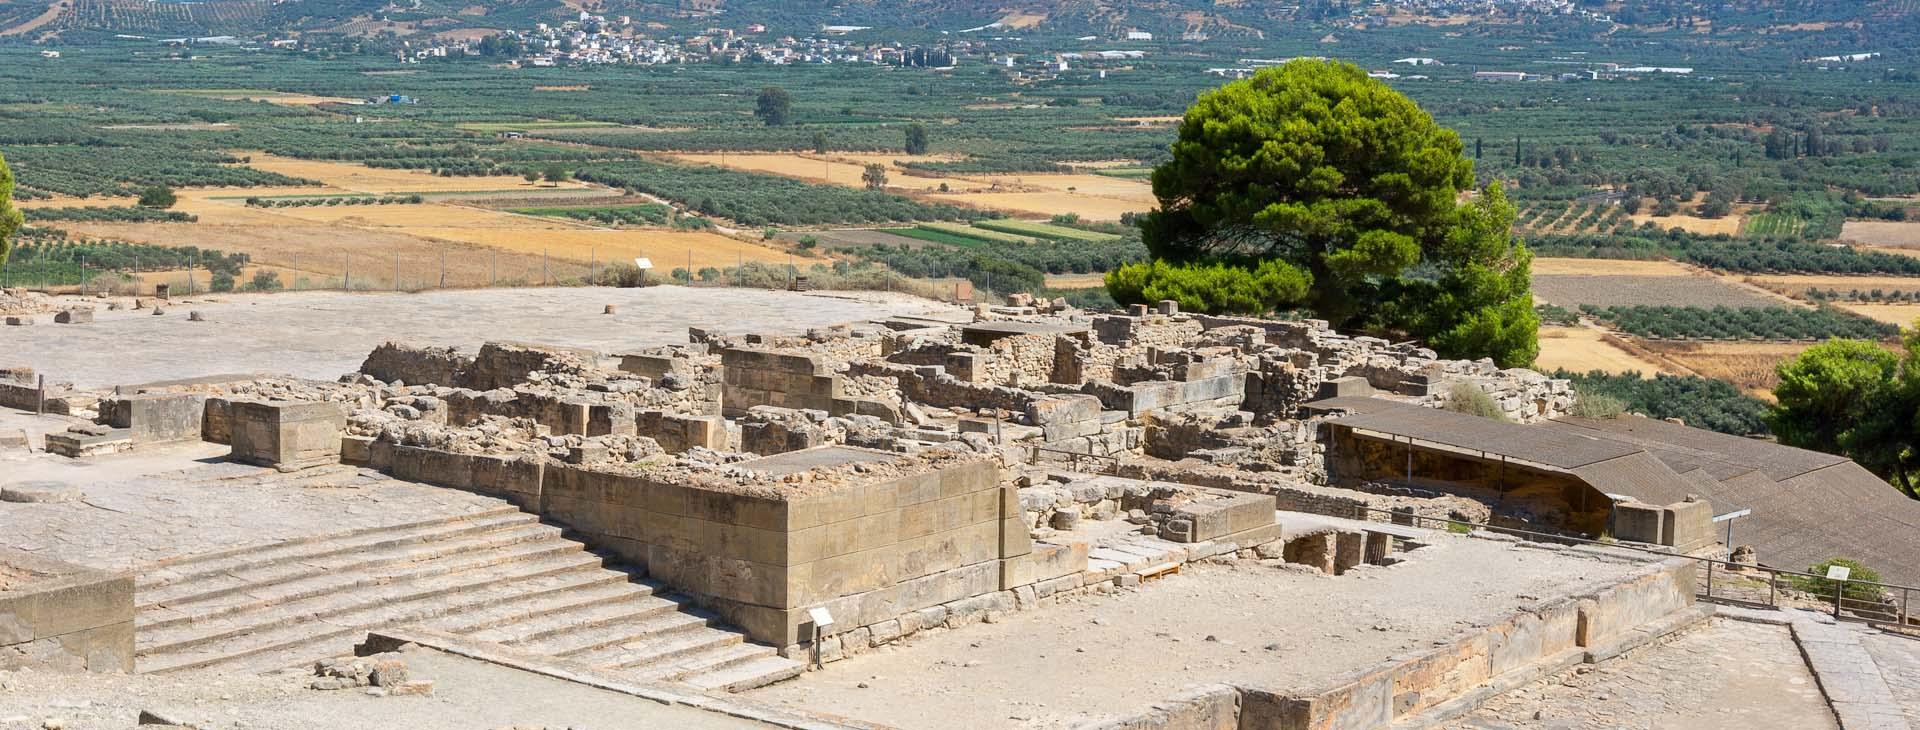 Archaeological site of Phaestos, Heraklion